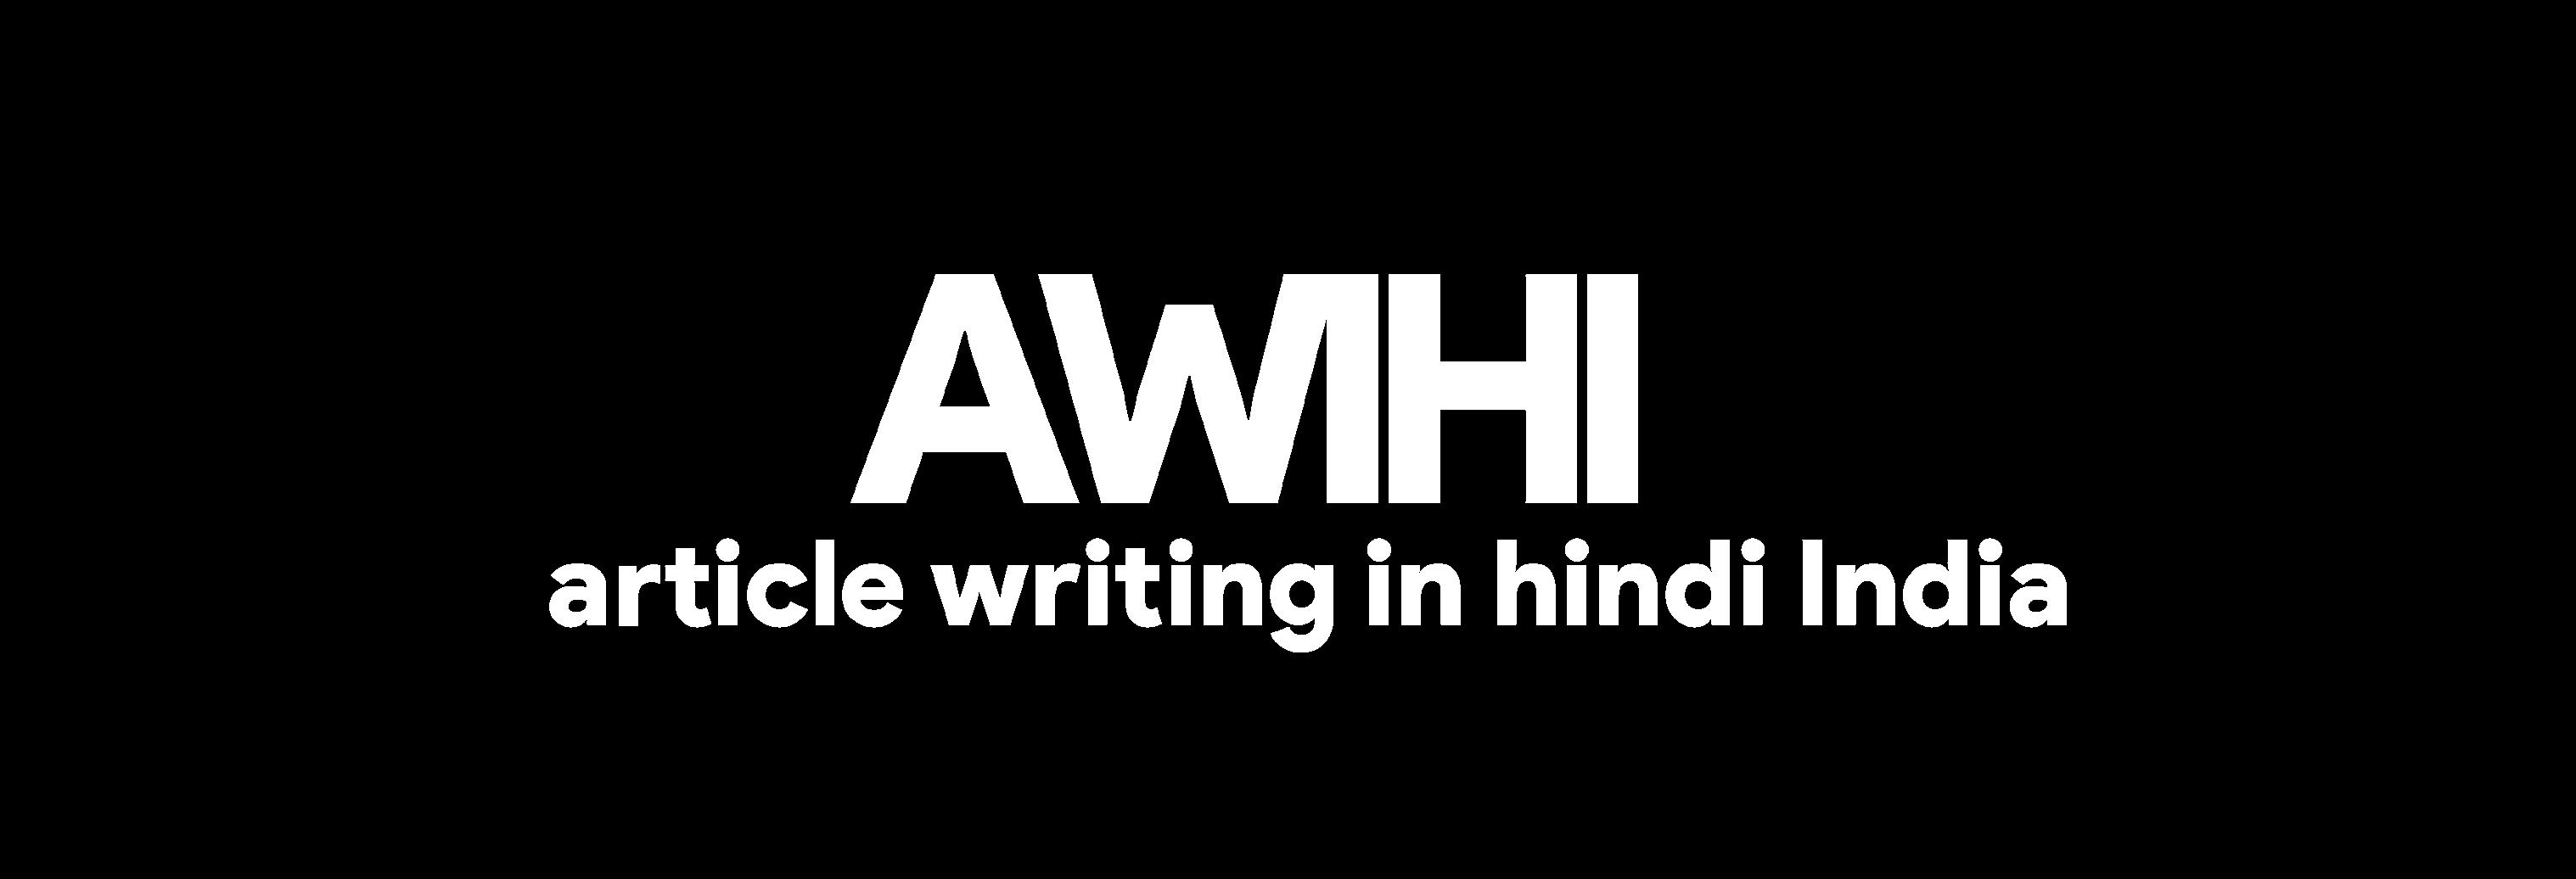 Article writing in hindi India new logo